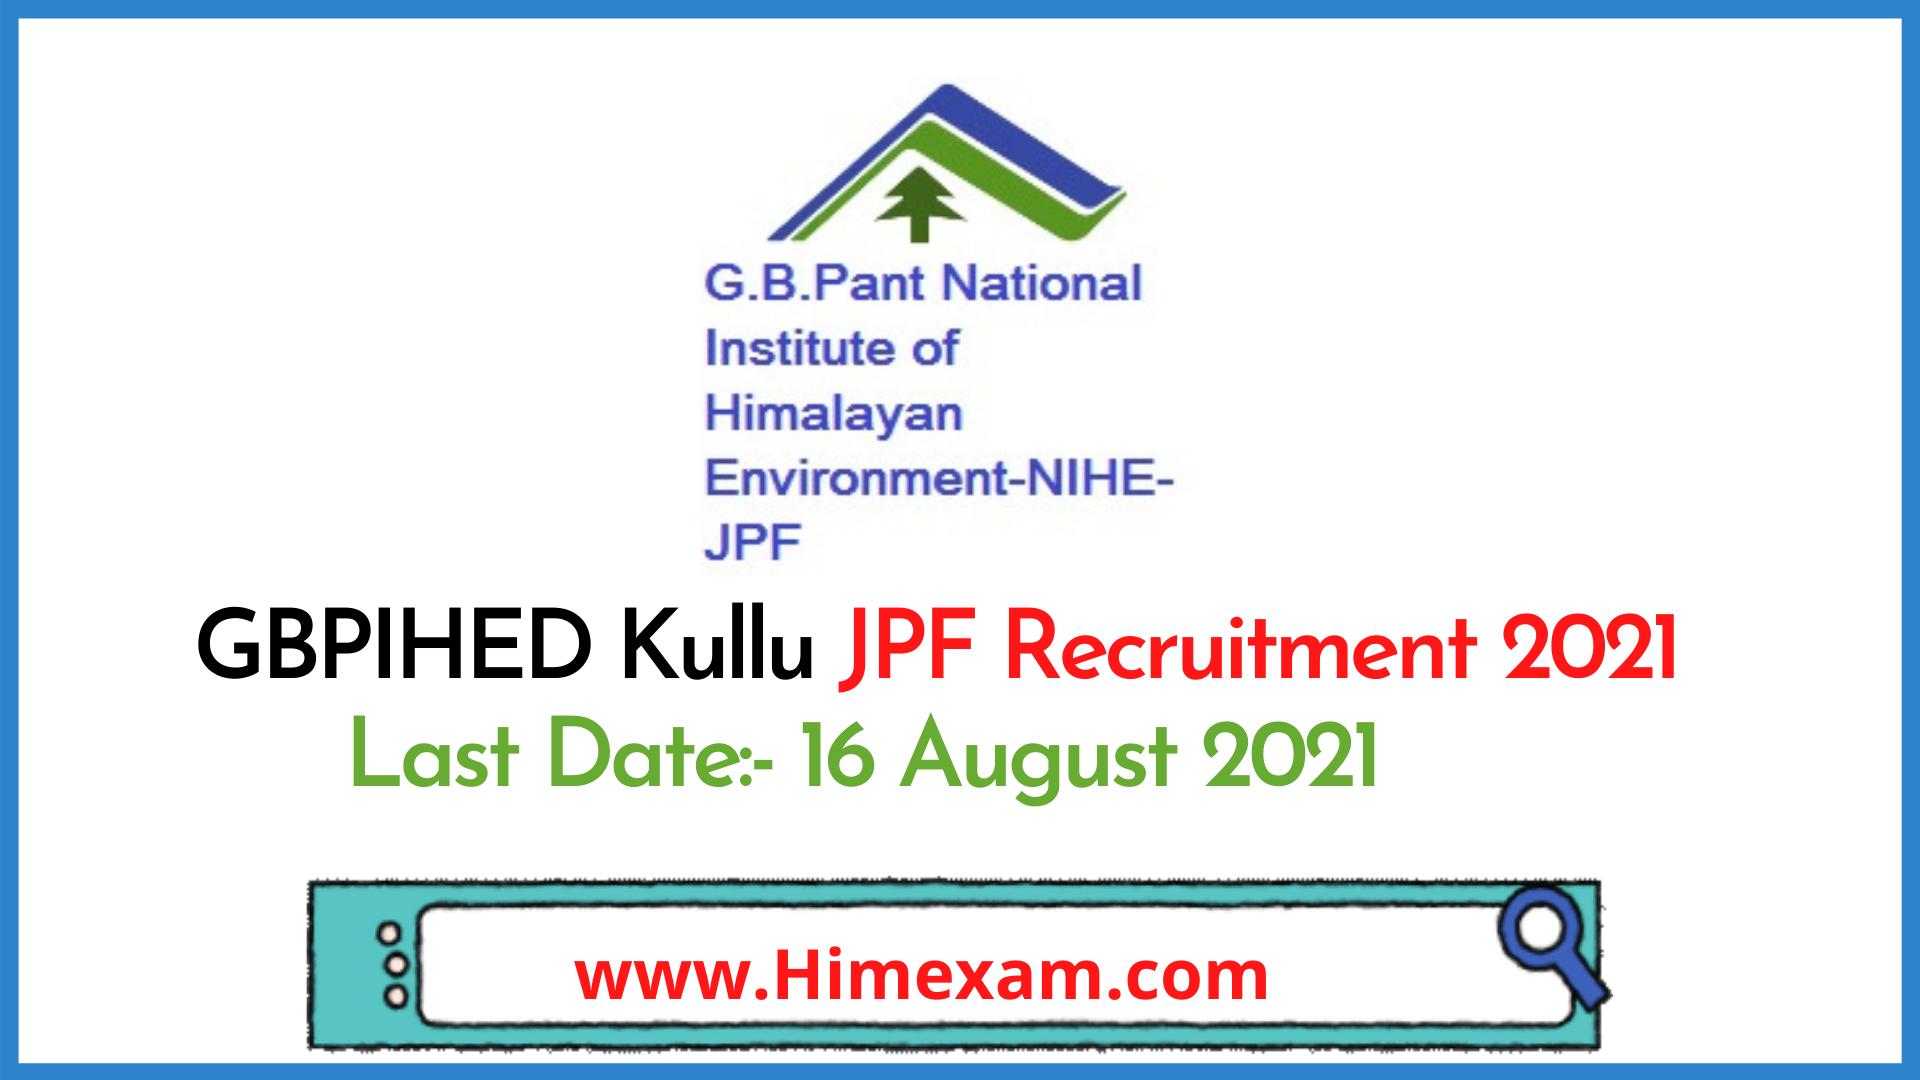 GBPIHED Kullu JPF Recruitment 2021